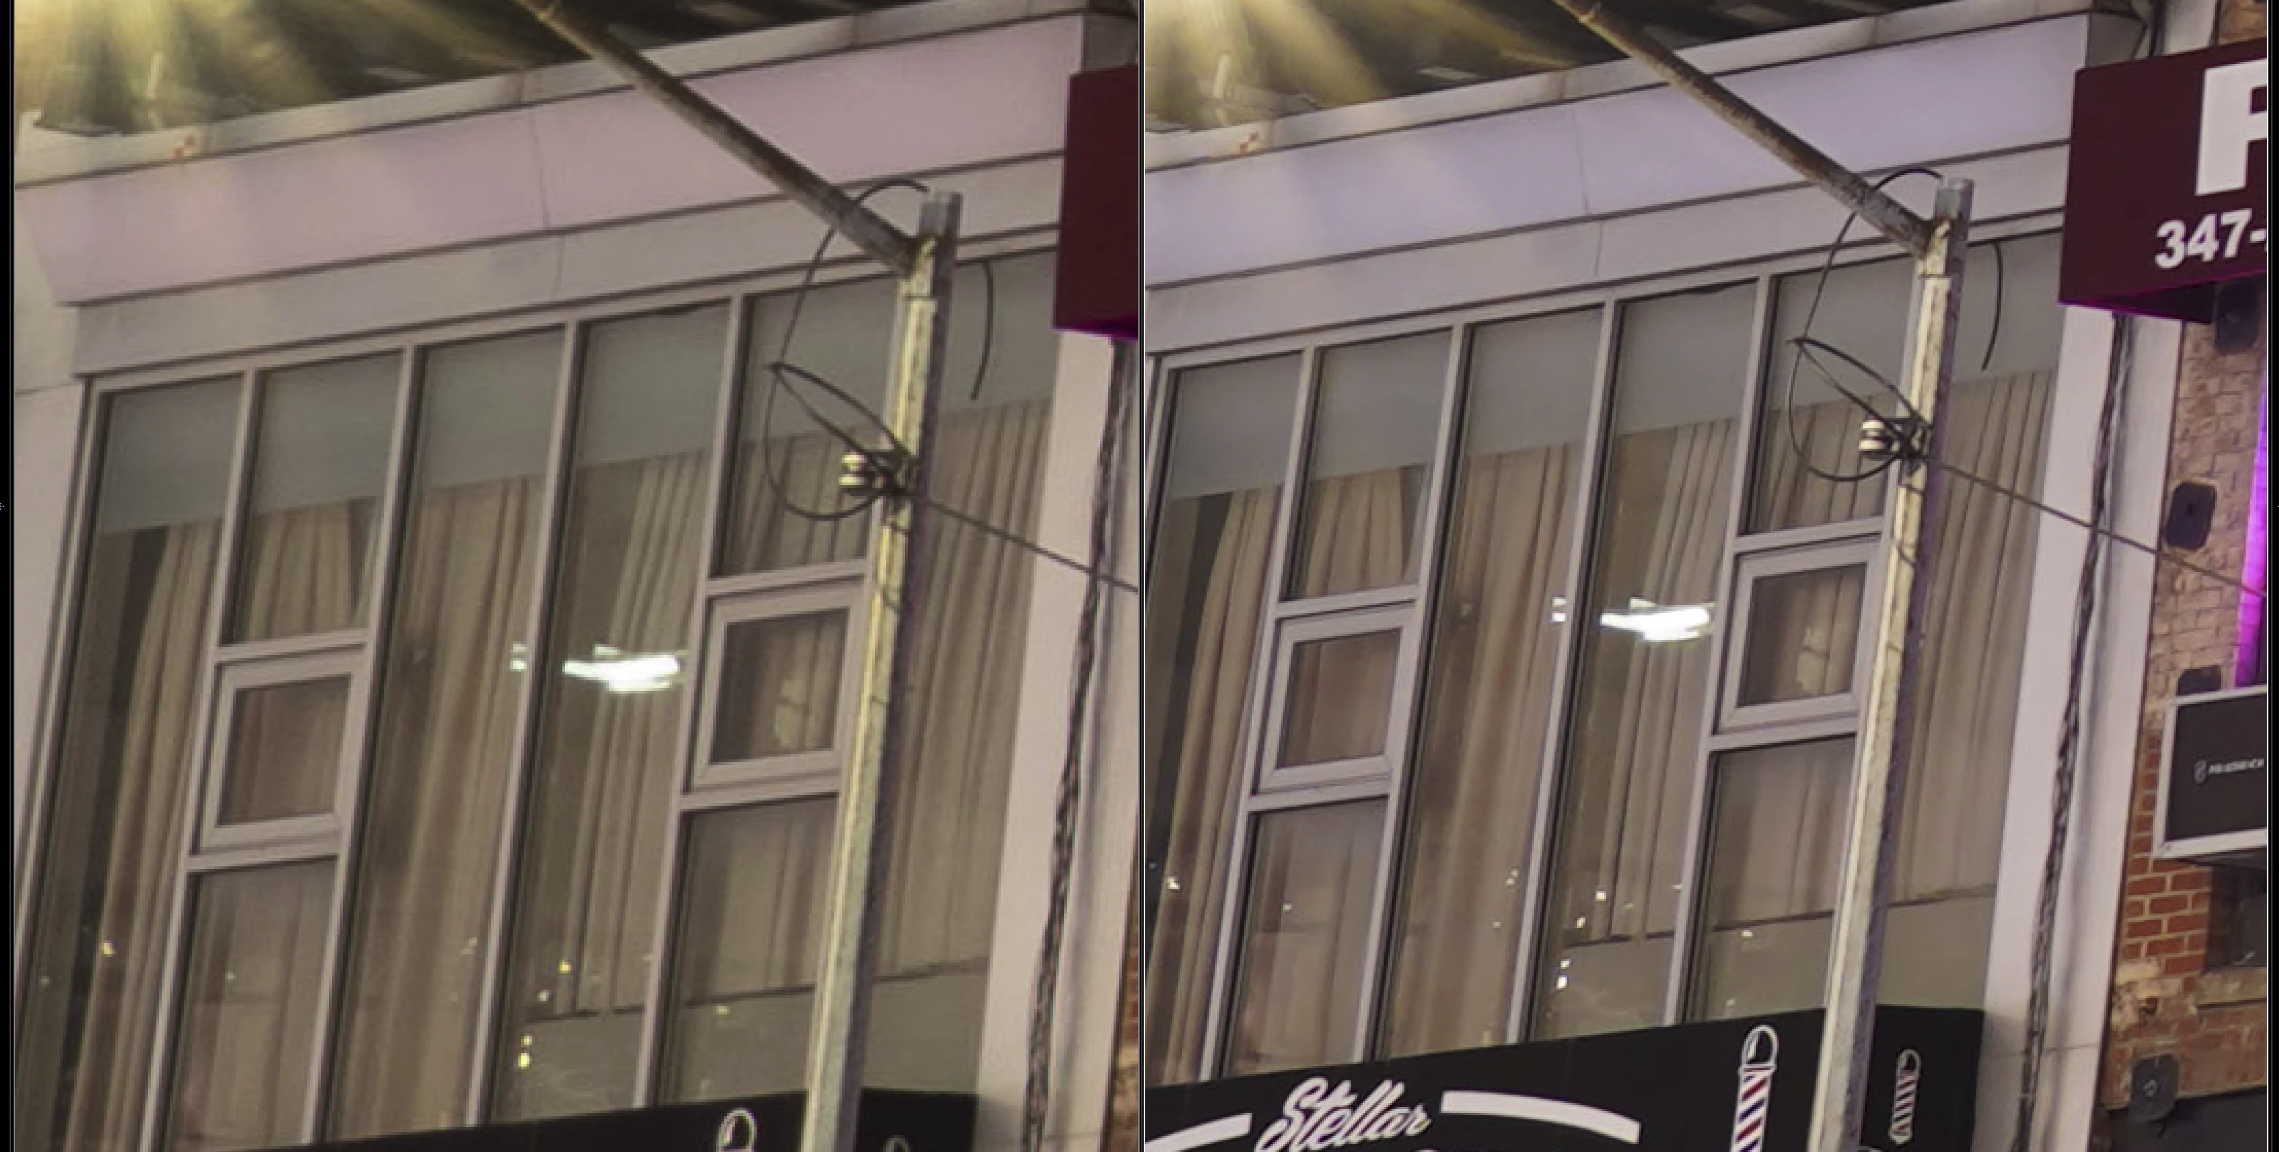 Sony a7R III vs a7R IV Image Quality Comparison